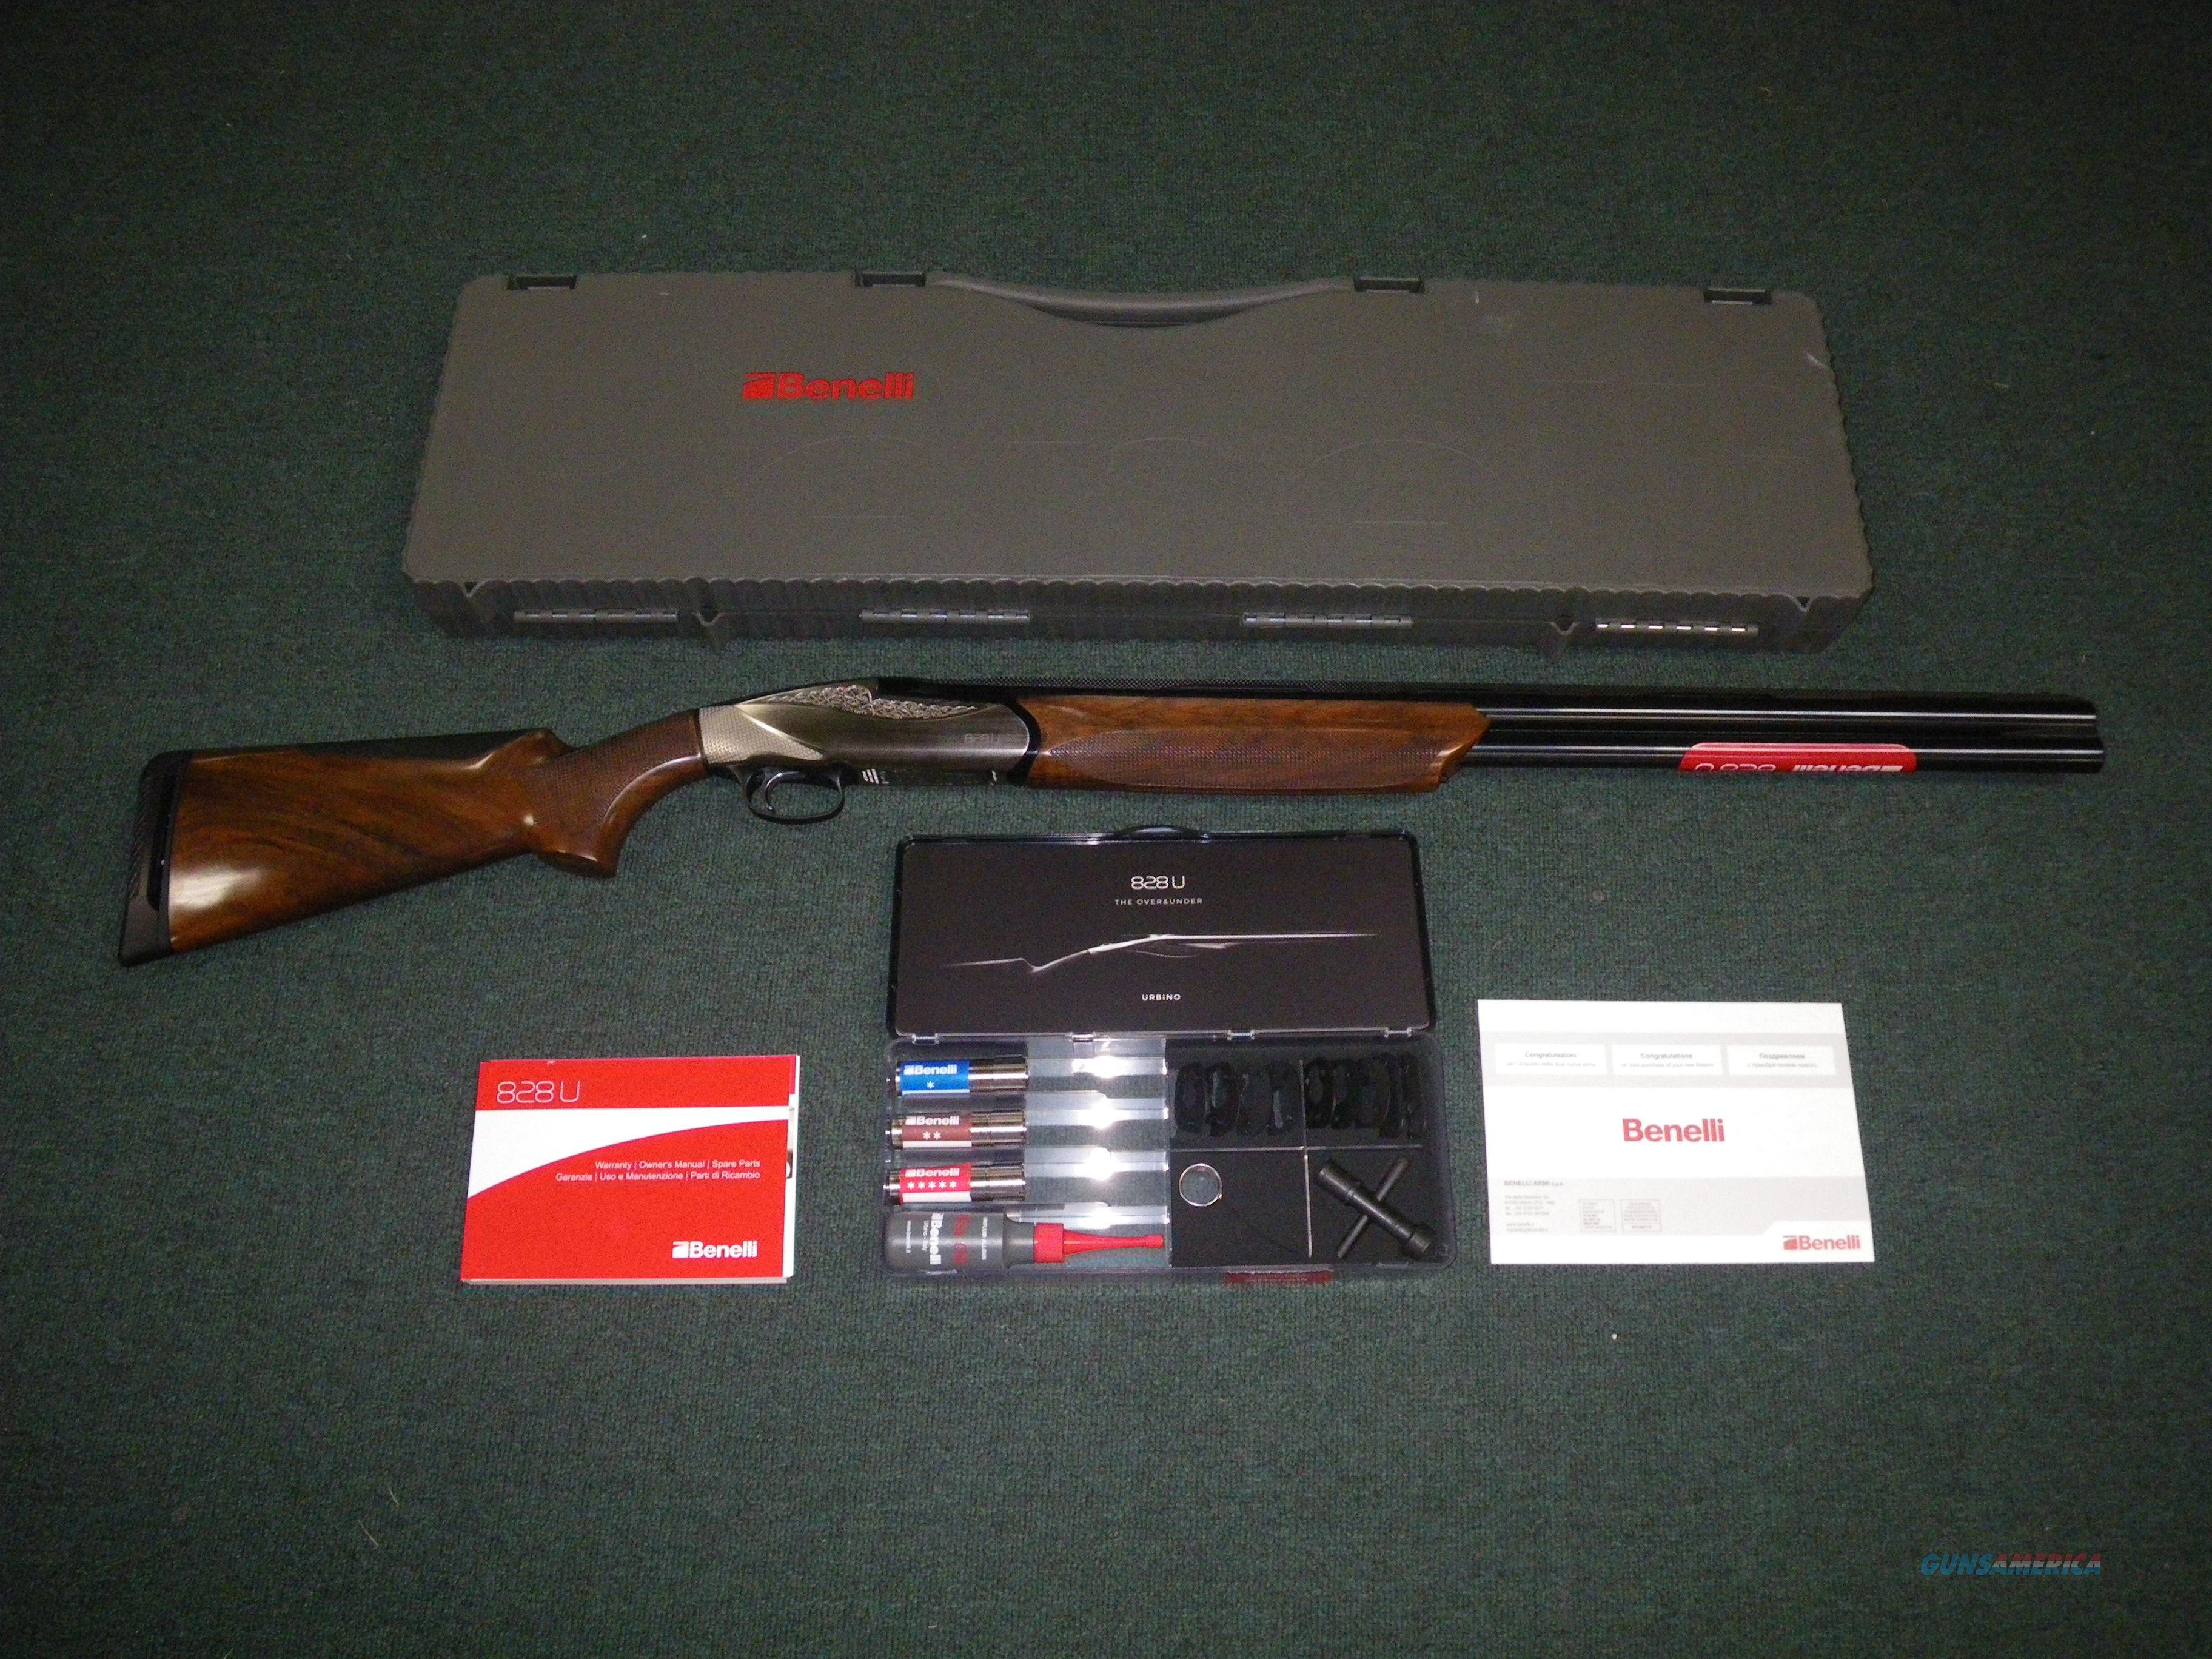 "Benelli 828U Shotgun Nickel/Wood 12ga 26"" NEW #10703  Guns > Shotguns > Benelli Shotguns > Sporting"